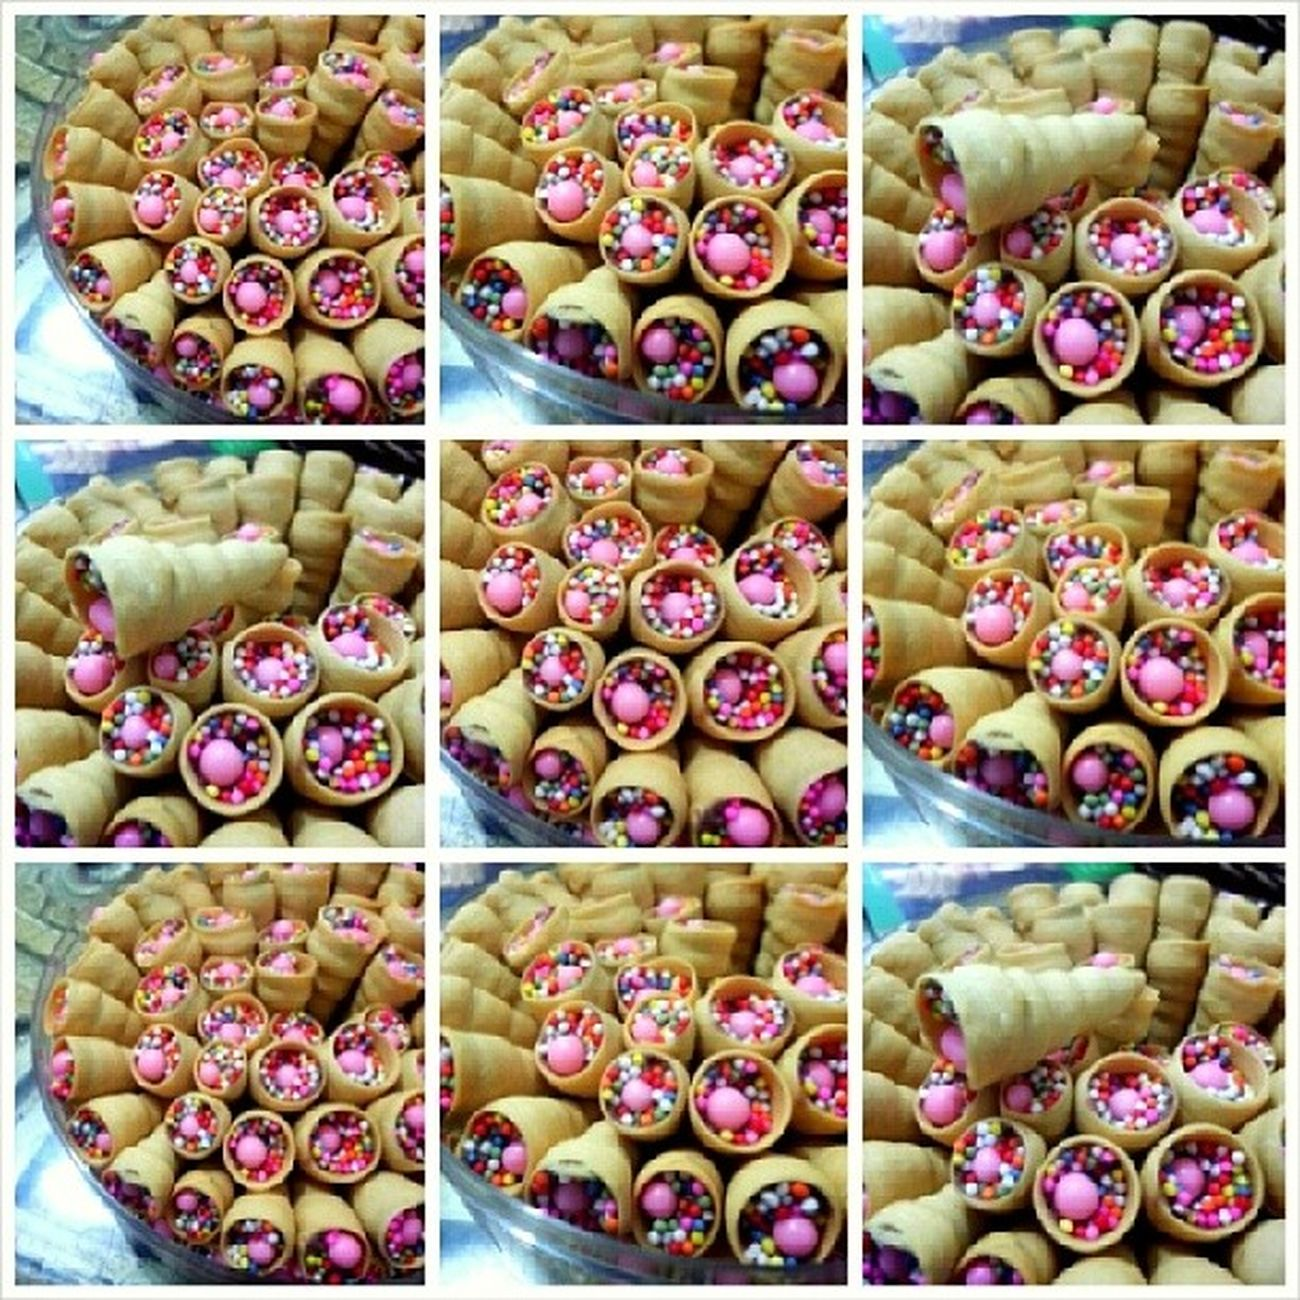 Dikirain mainan .. ga tau nya kue :)) Pink Cookies Sweet Chocochip foodporn nyemilnyemillucu udahahkebanyakanhashtah